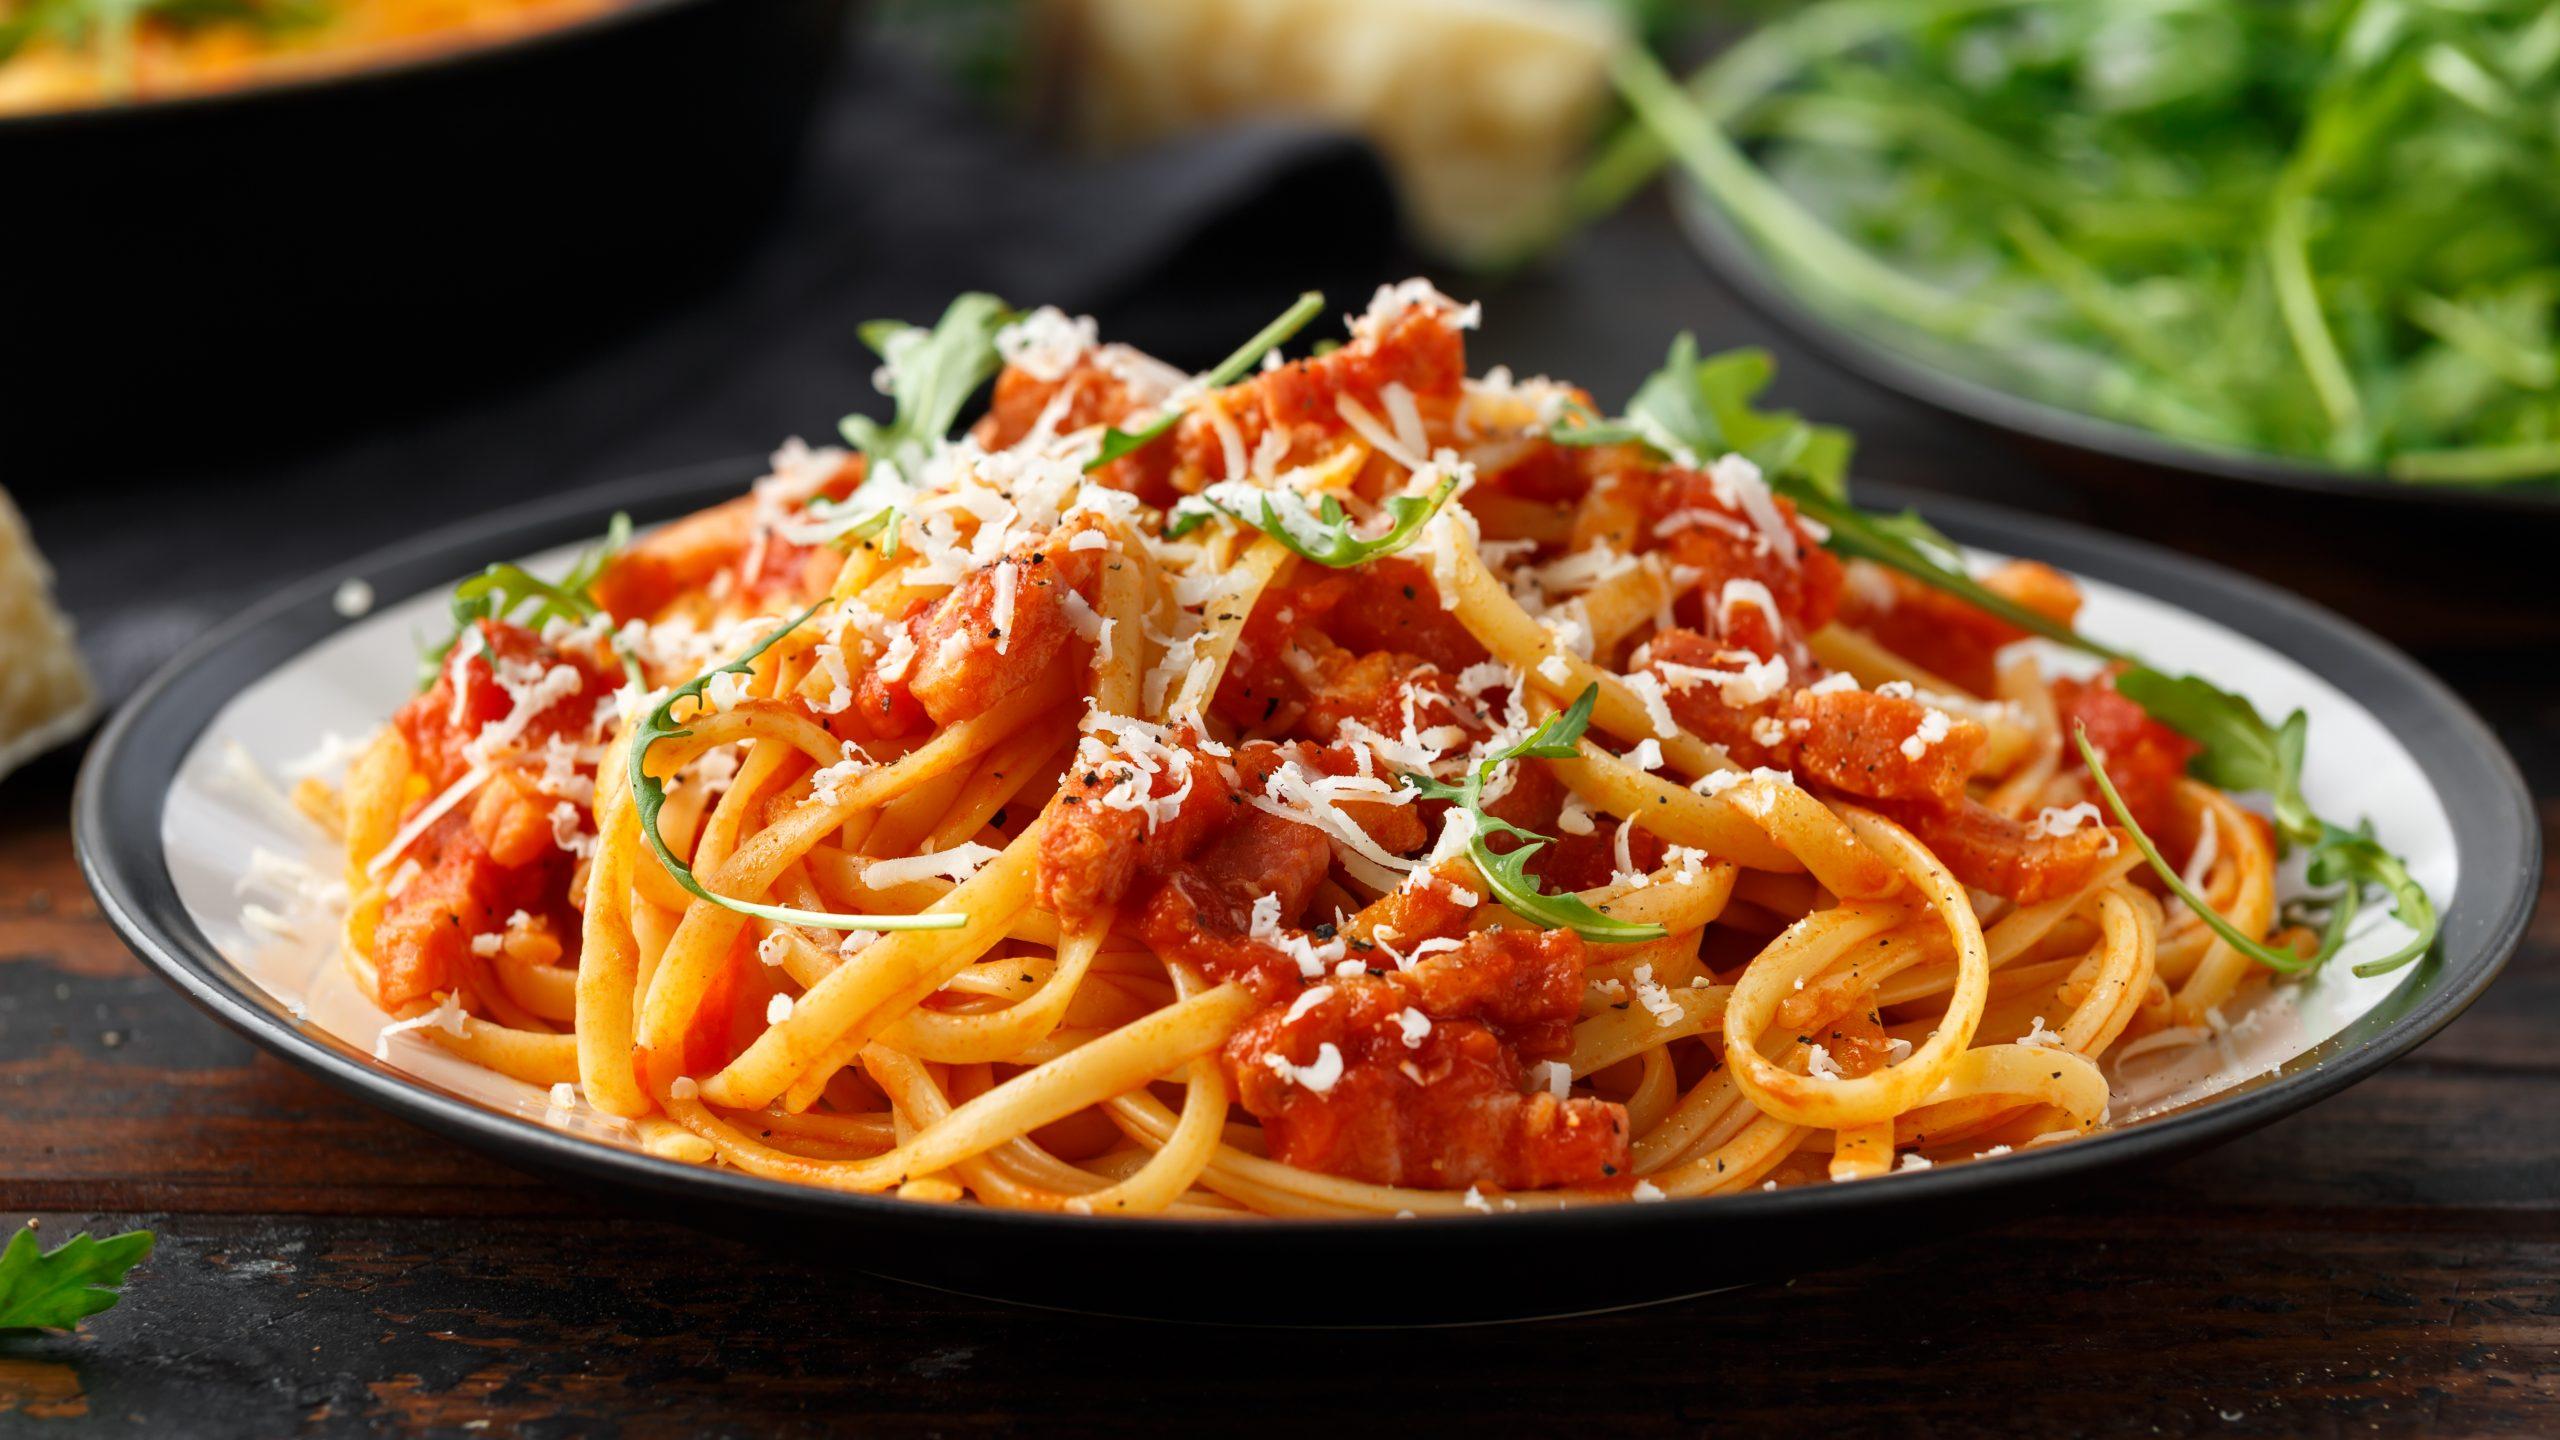 Spaghetti,Alla,Amatriciana,With,Pancetta,Bacon,,Tomatoes,And,Pecorino,Cheese